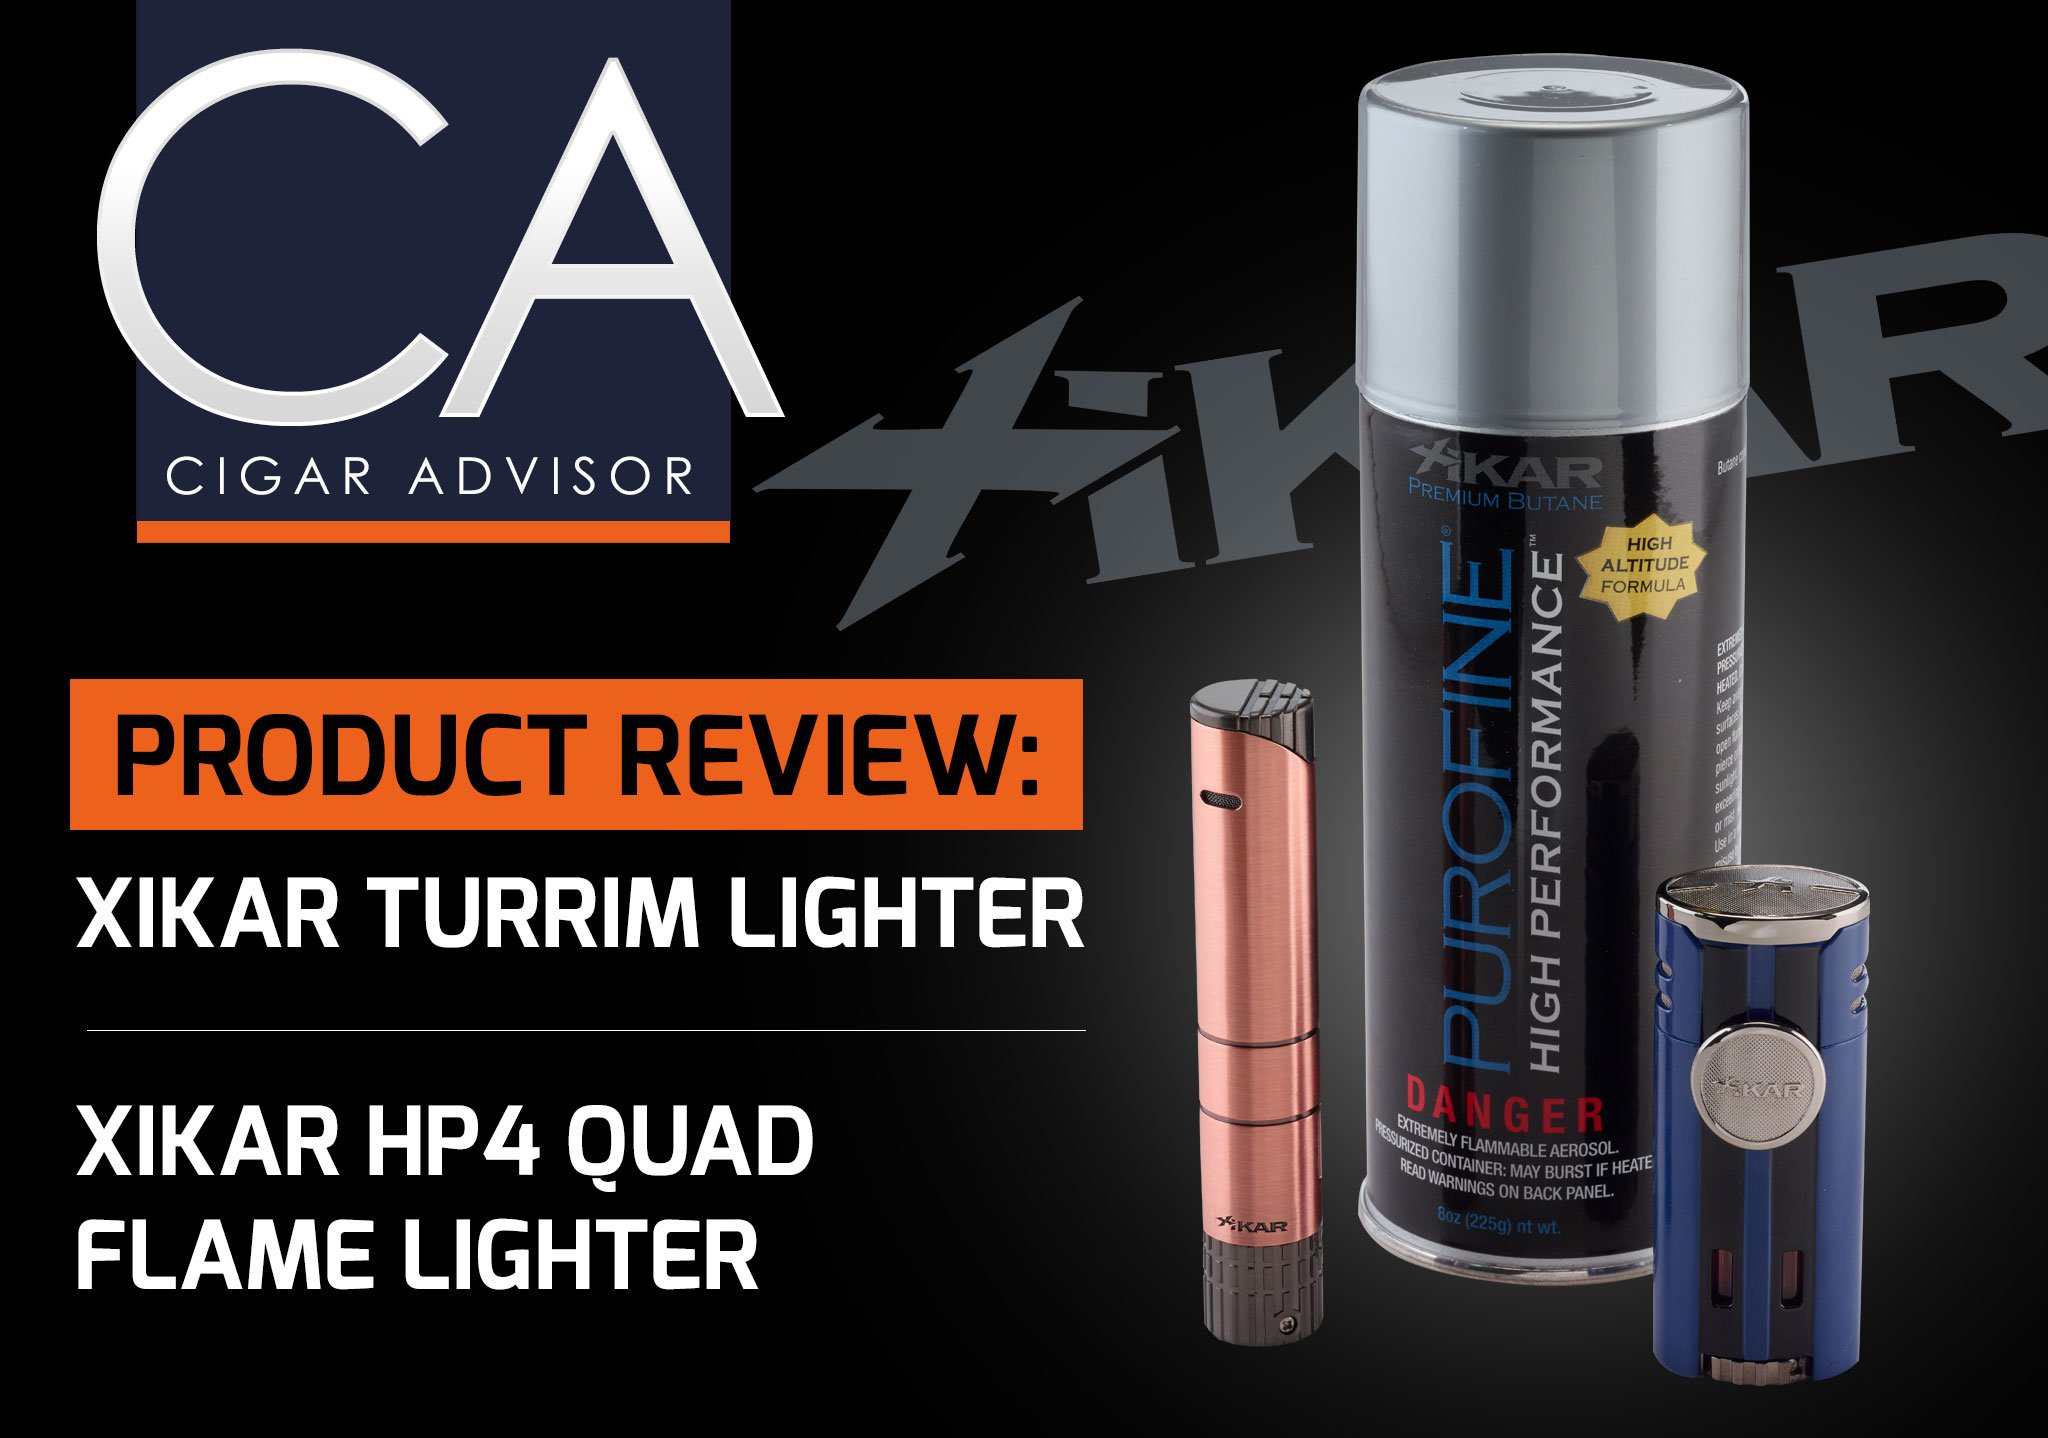 CA Reviews: XIKAR Cigar Lighters – Turrim & HP4 Lighters + PuroFine Butane